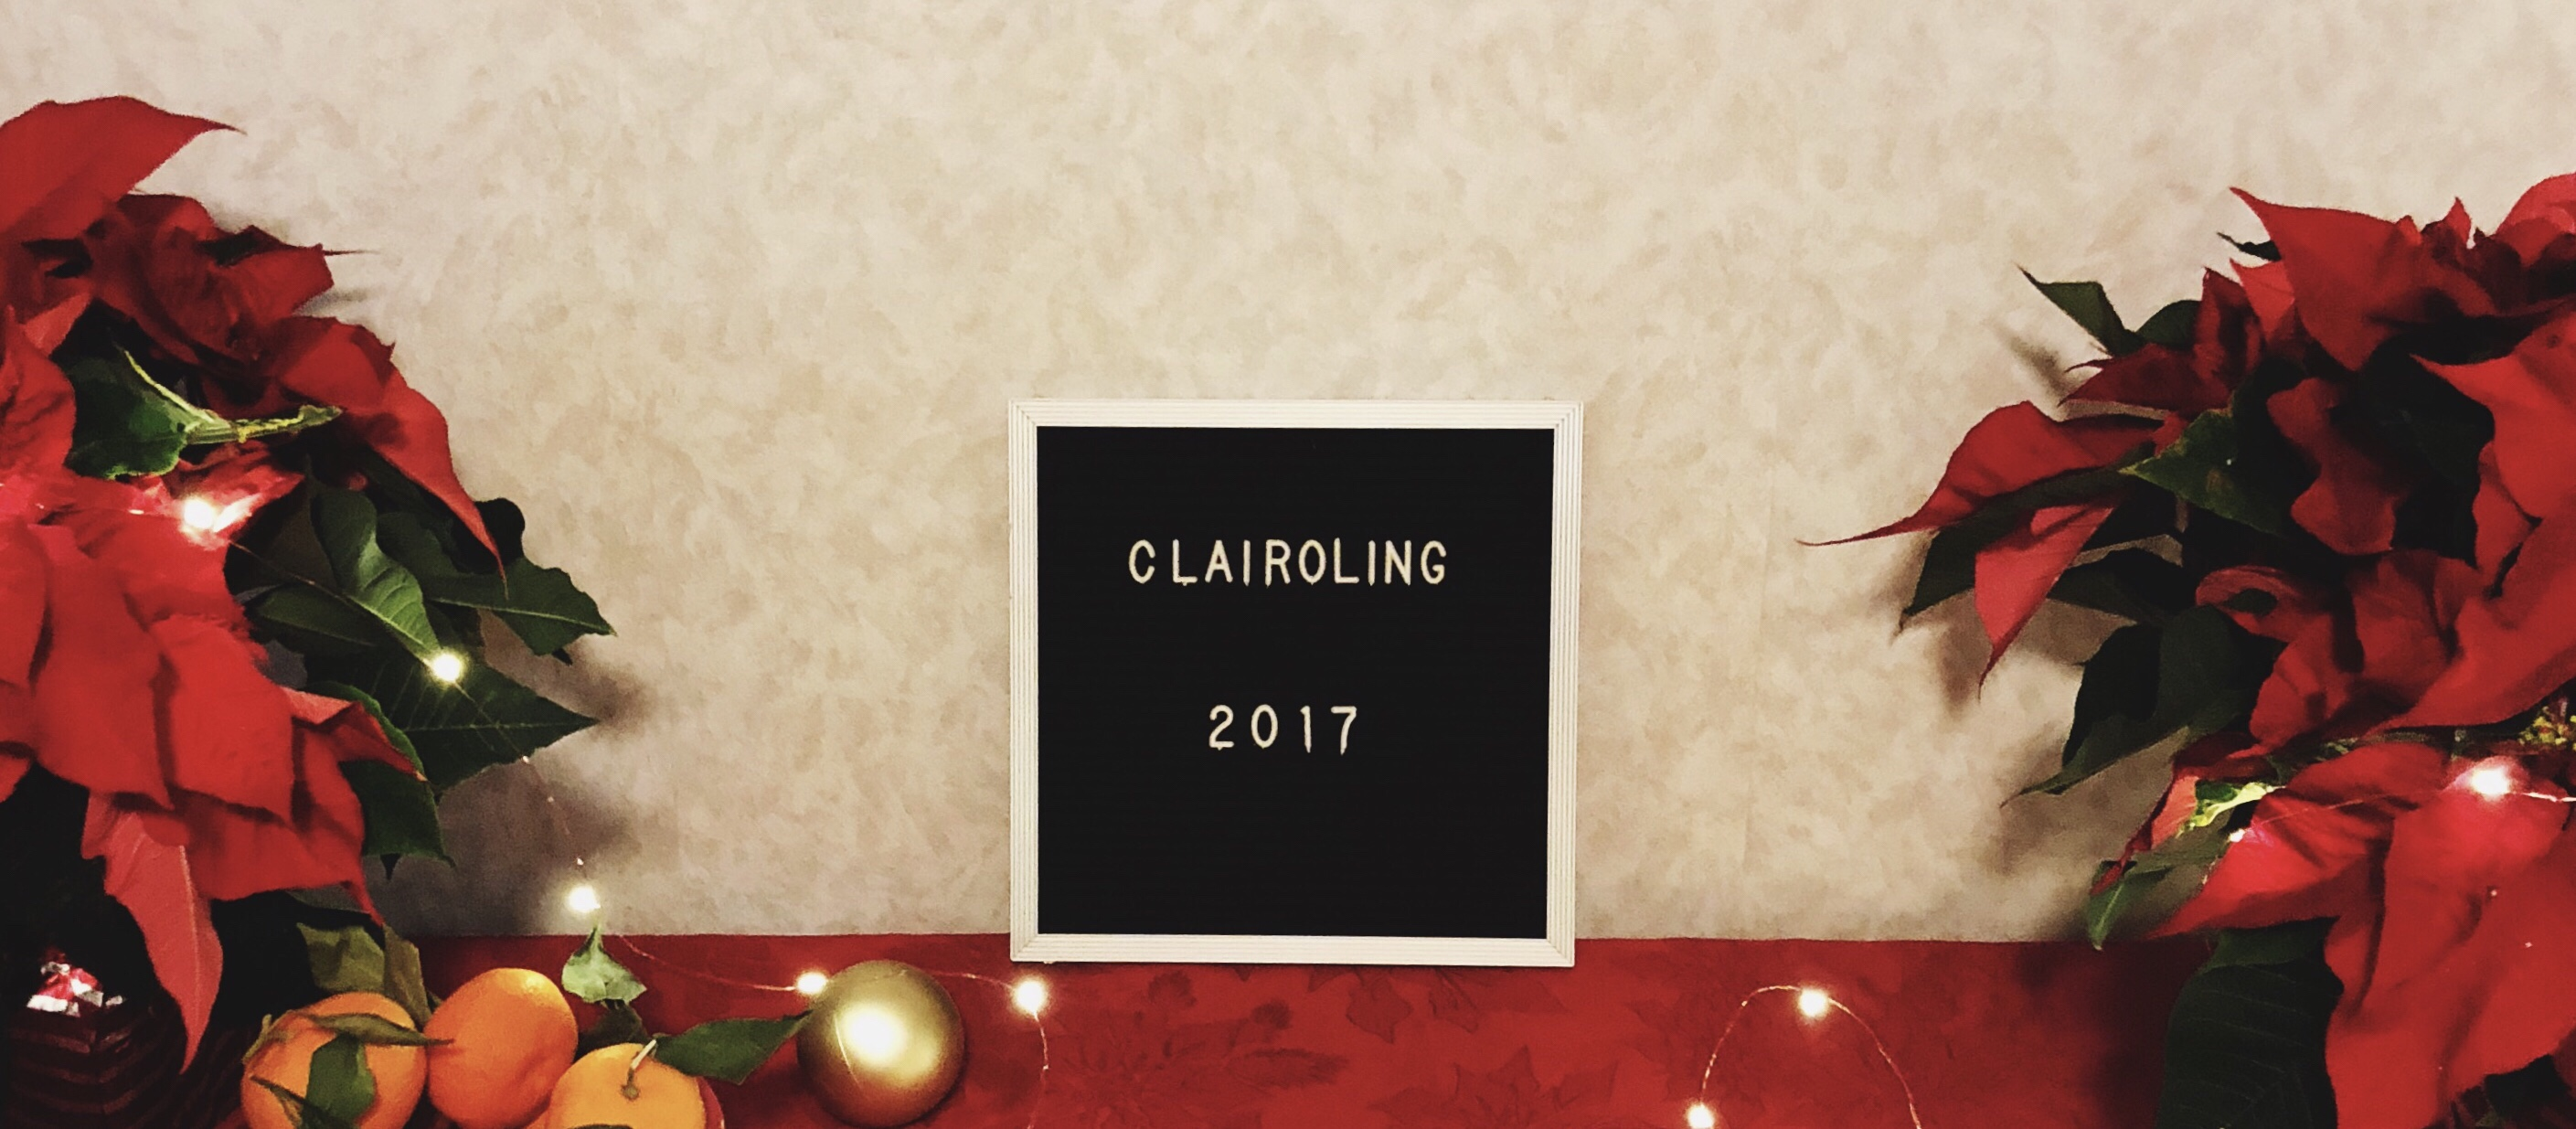 Clairoling